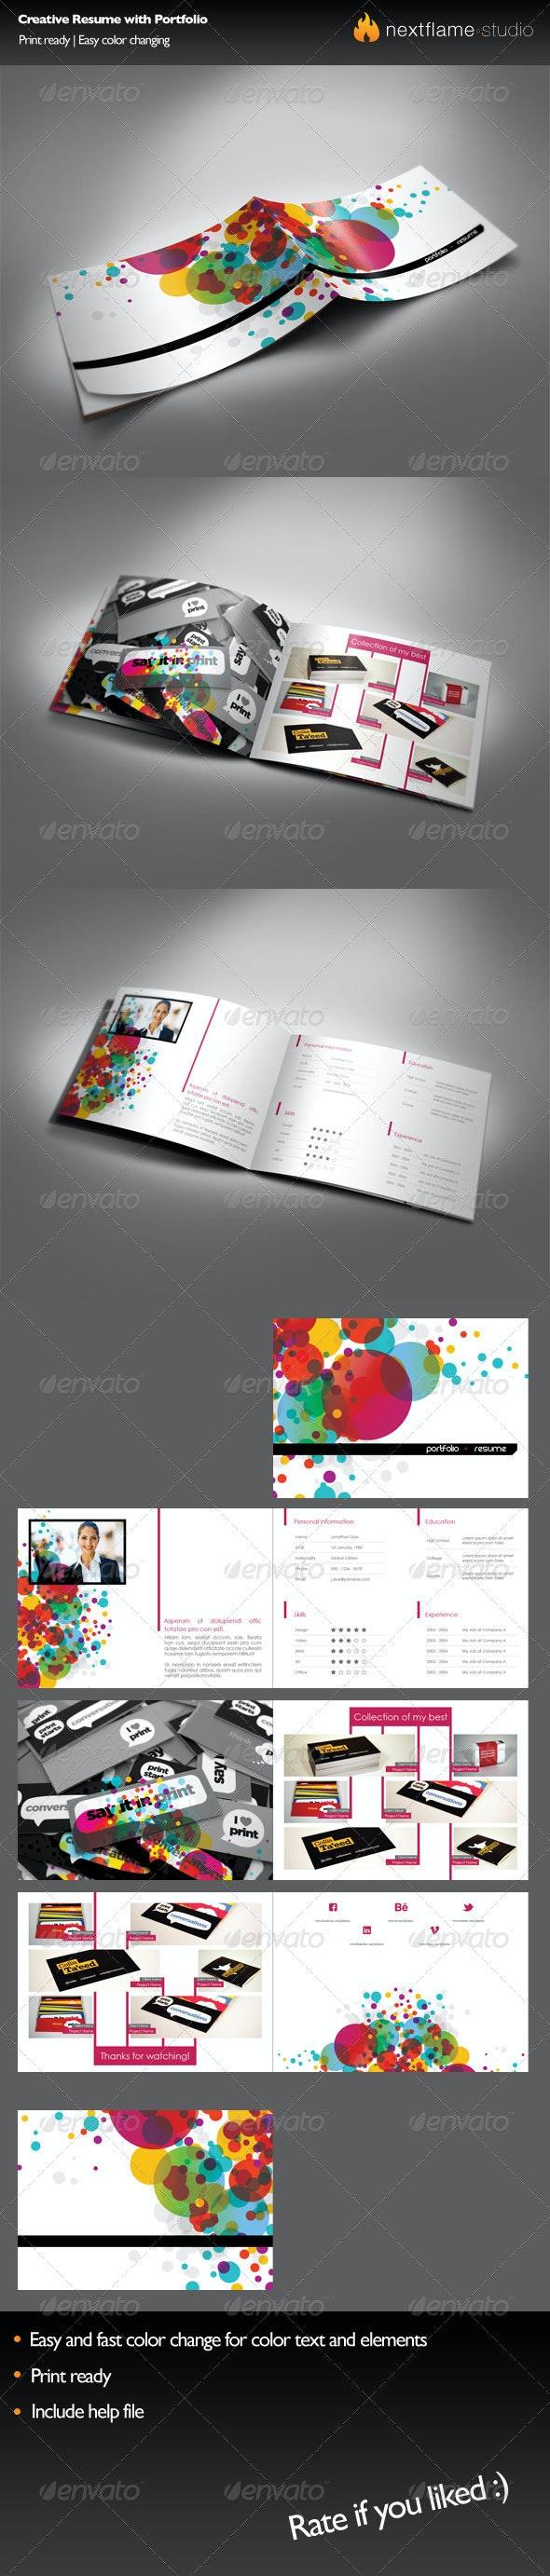 Creative Resume with Portfolio - Resumes Stationery